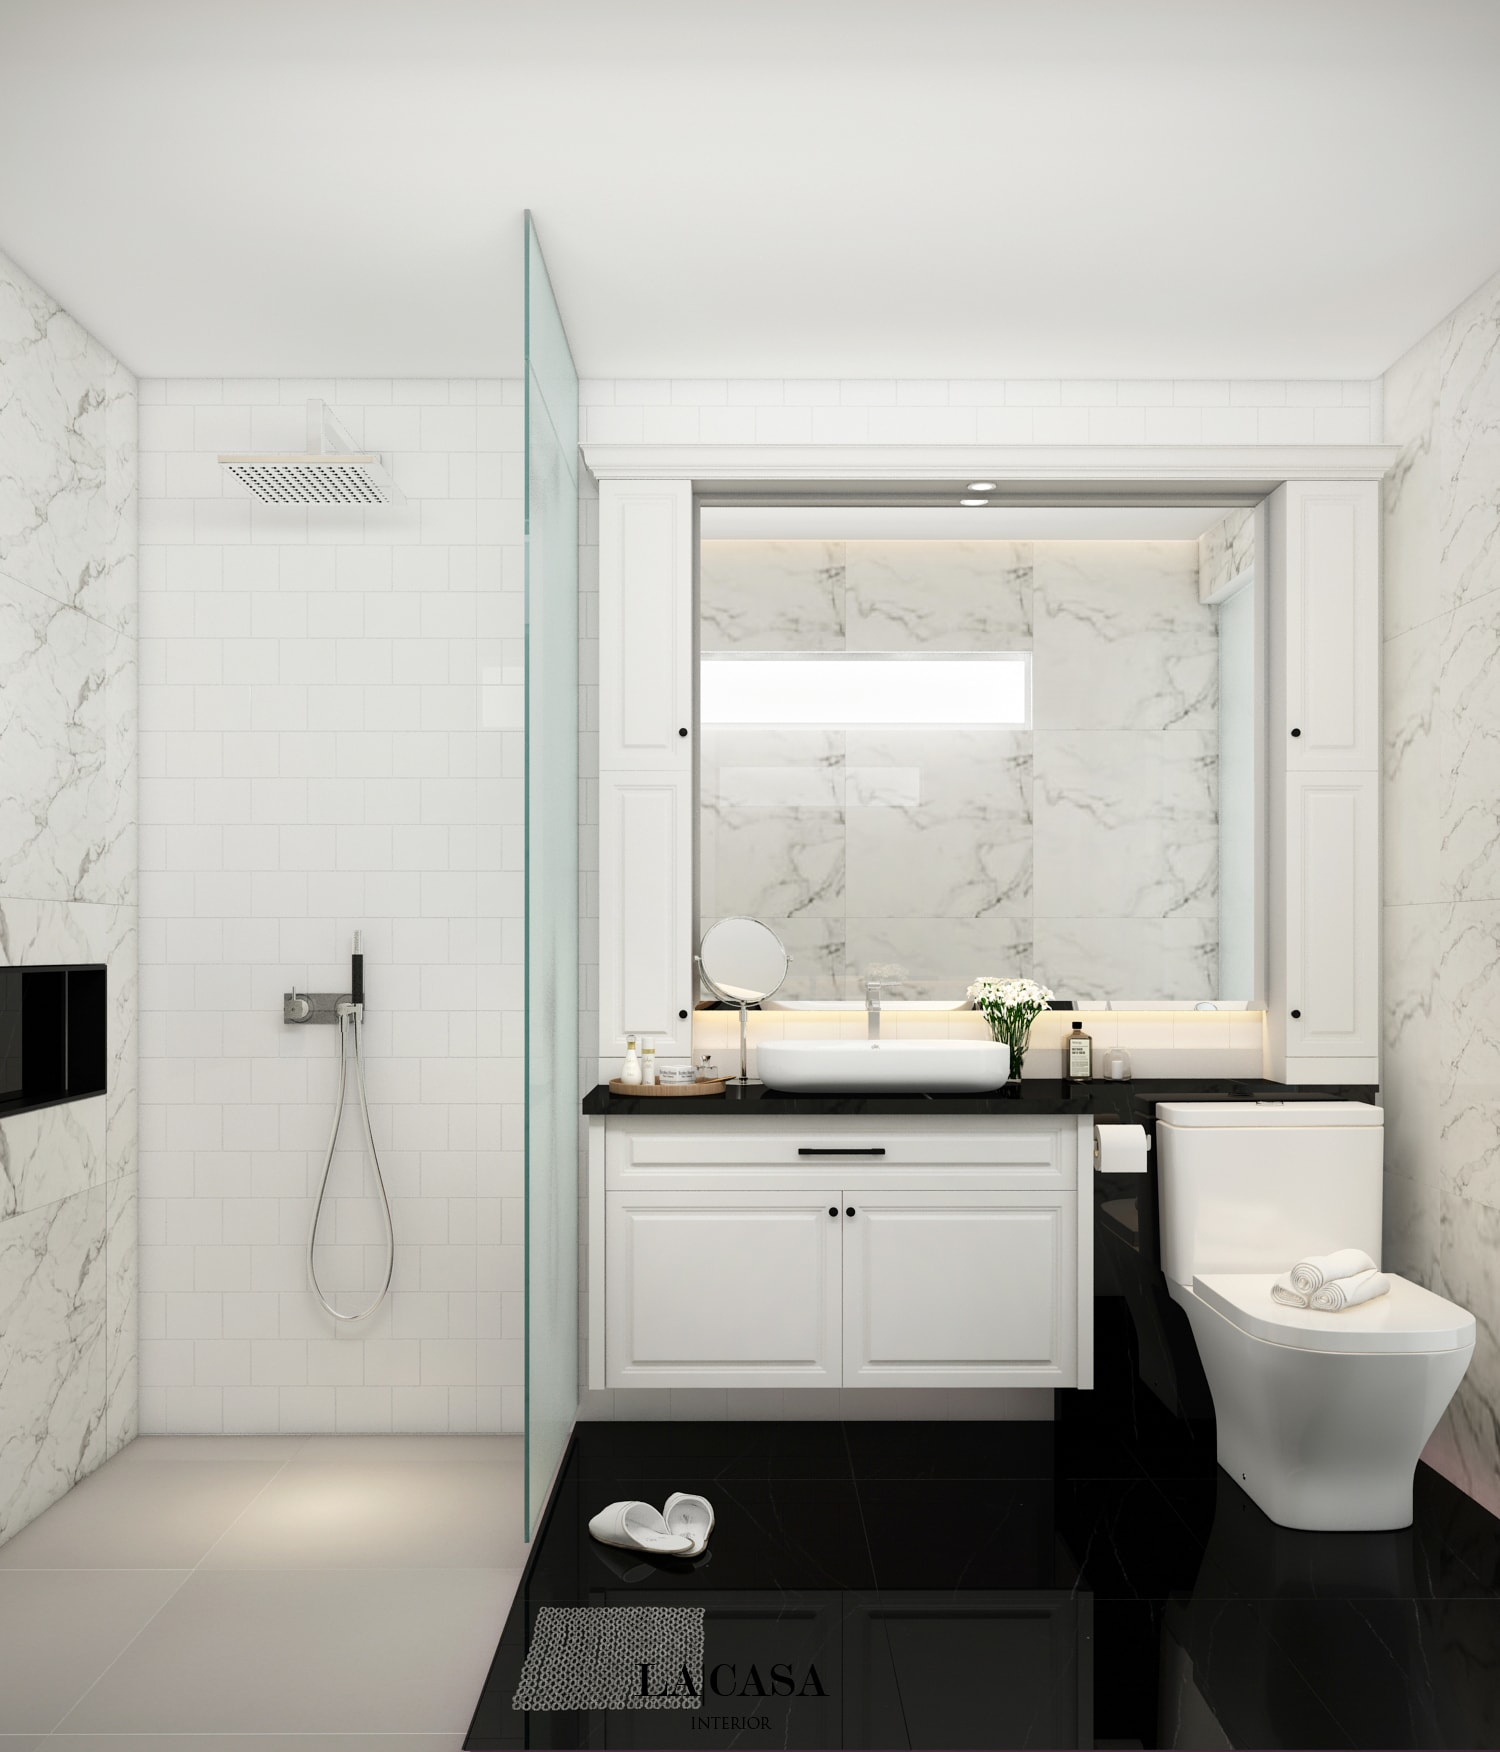 pengerjaan oleh la casa interior 8 kamar mandi